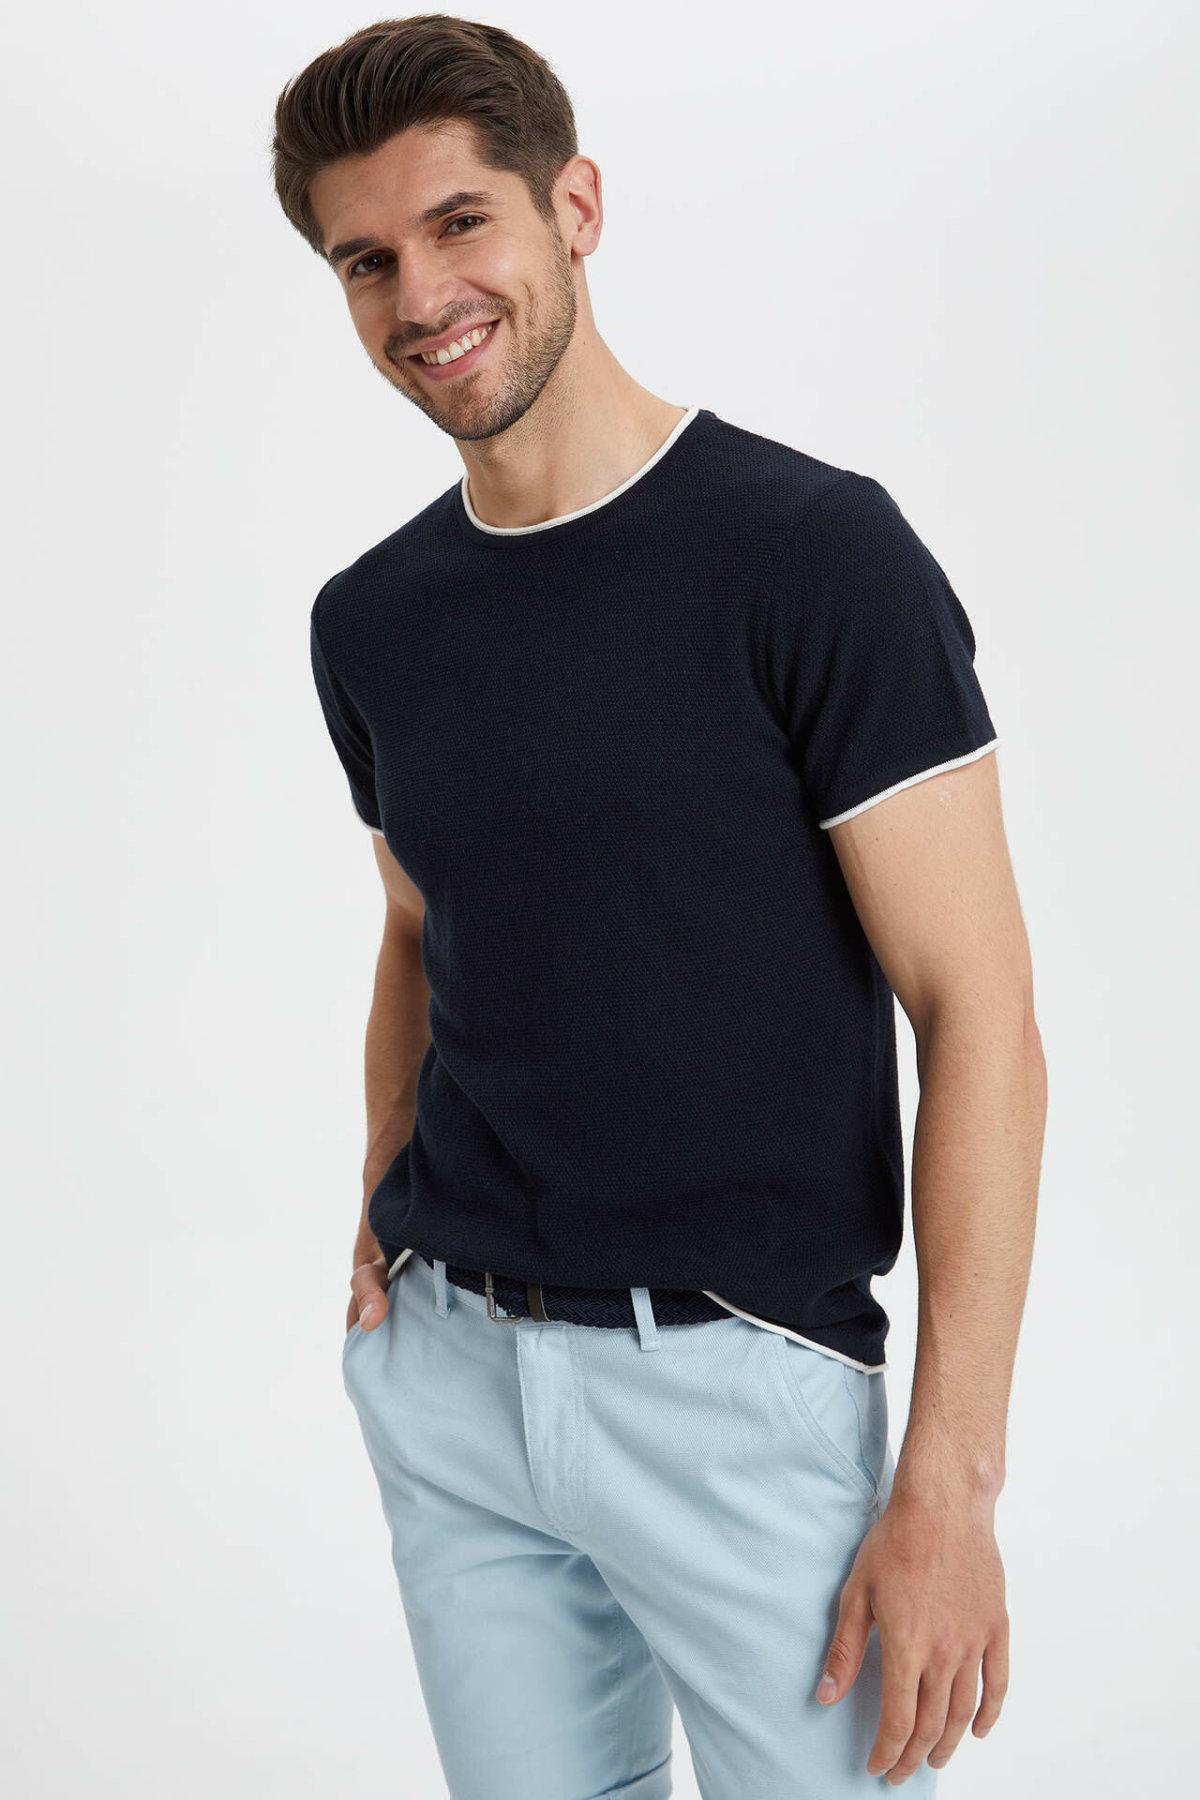 DeFacto Men Summer Crew Pure Color Shirt Tops Fashion Loose Simple Cotton Shirt Tops Mens Breathable New-L7207AZ19SM